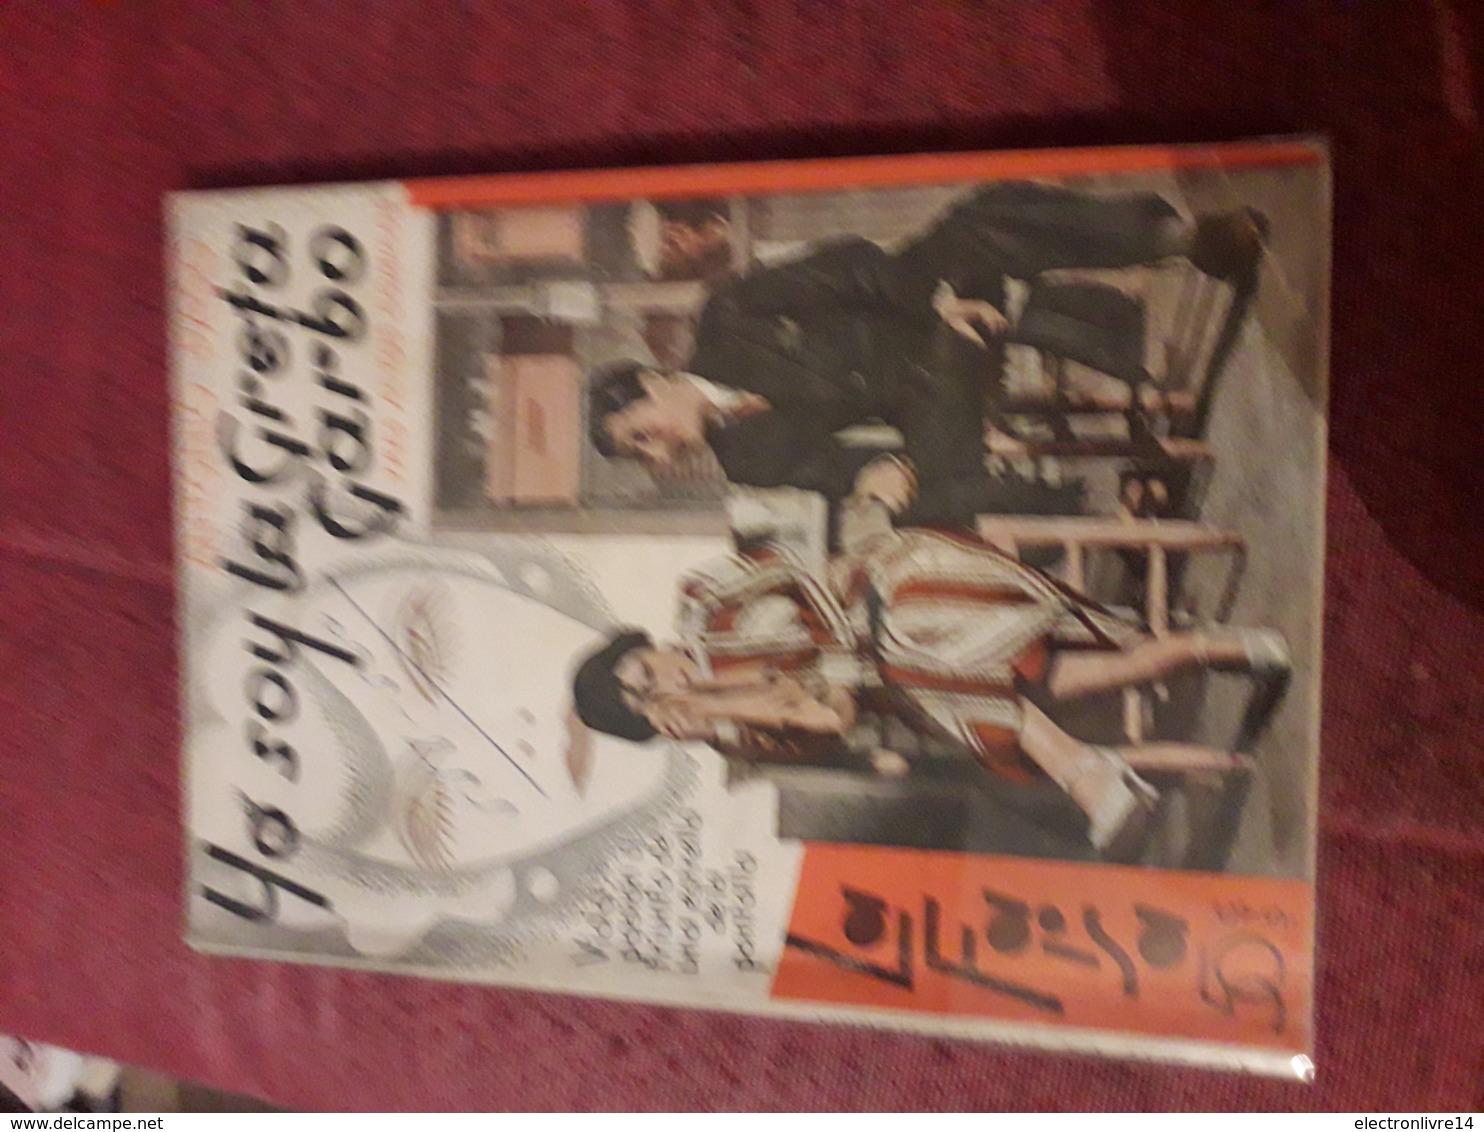 Petit Fascicule Populaire Espagnol Des Annees 40 La Farsa L Yo Soy La Greta Garbo Paso - Littérature